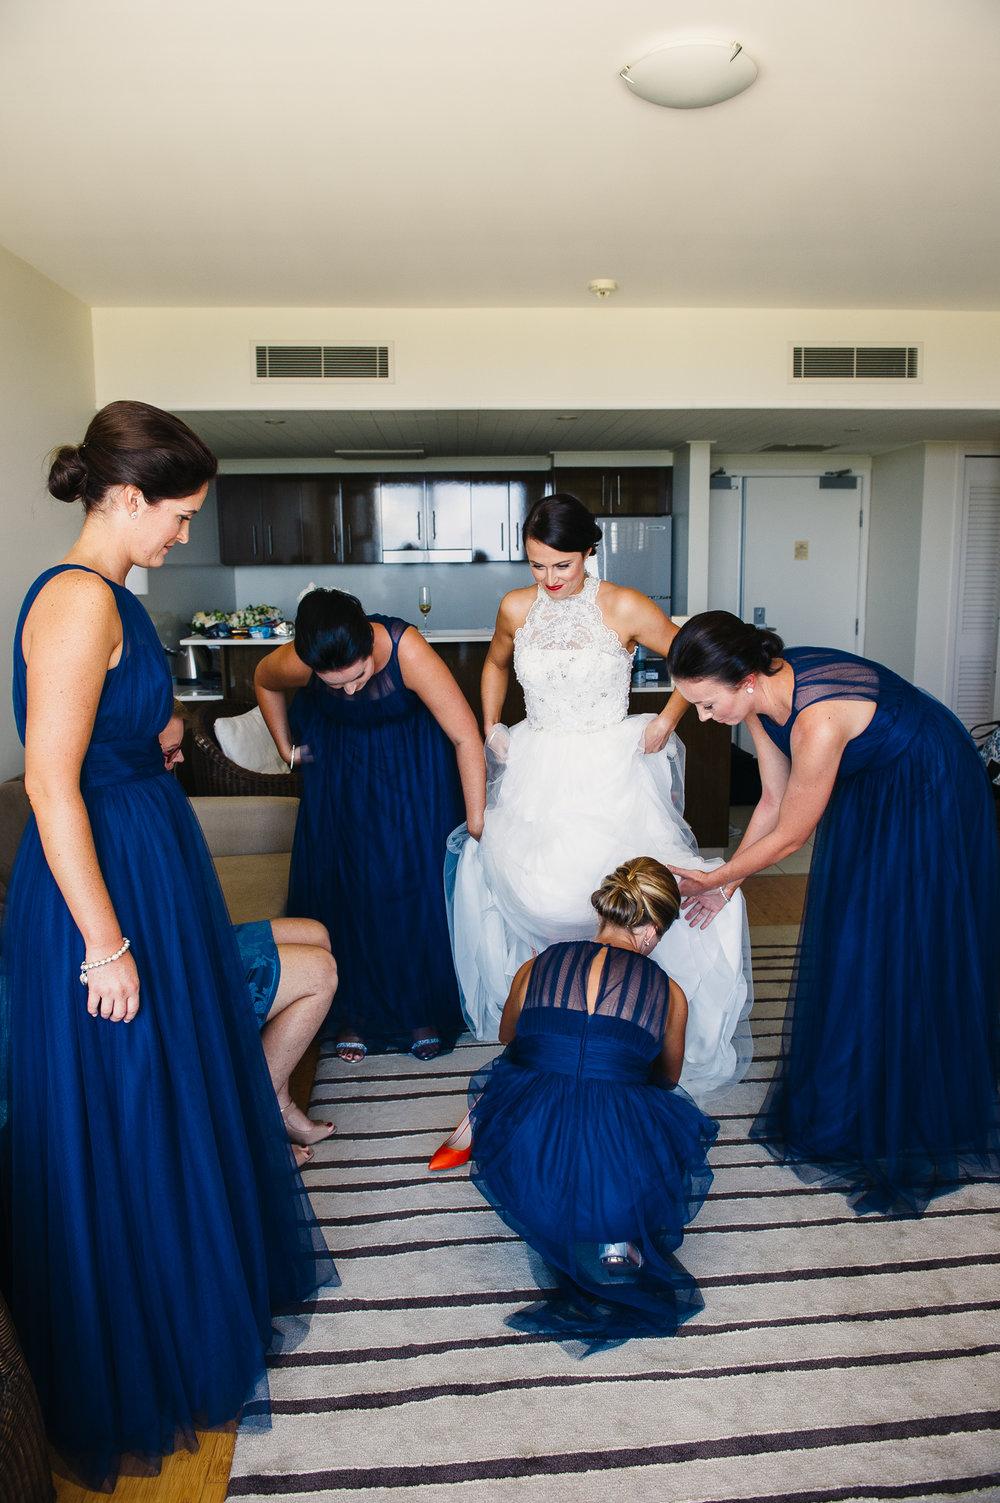 Osteria wedding_New Black Studios 17.jpg